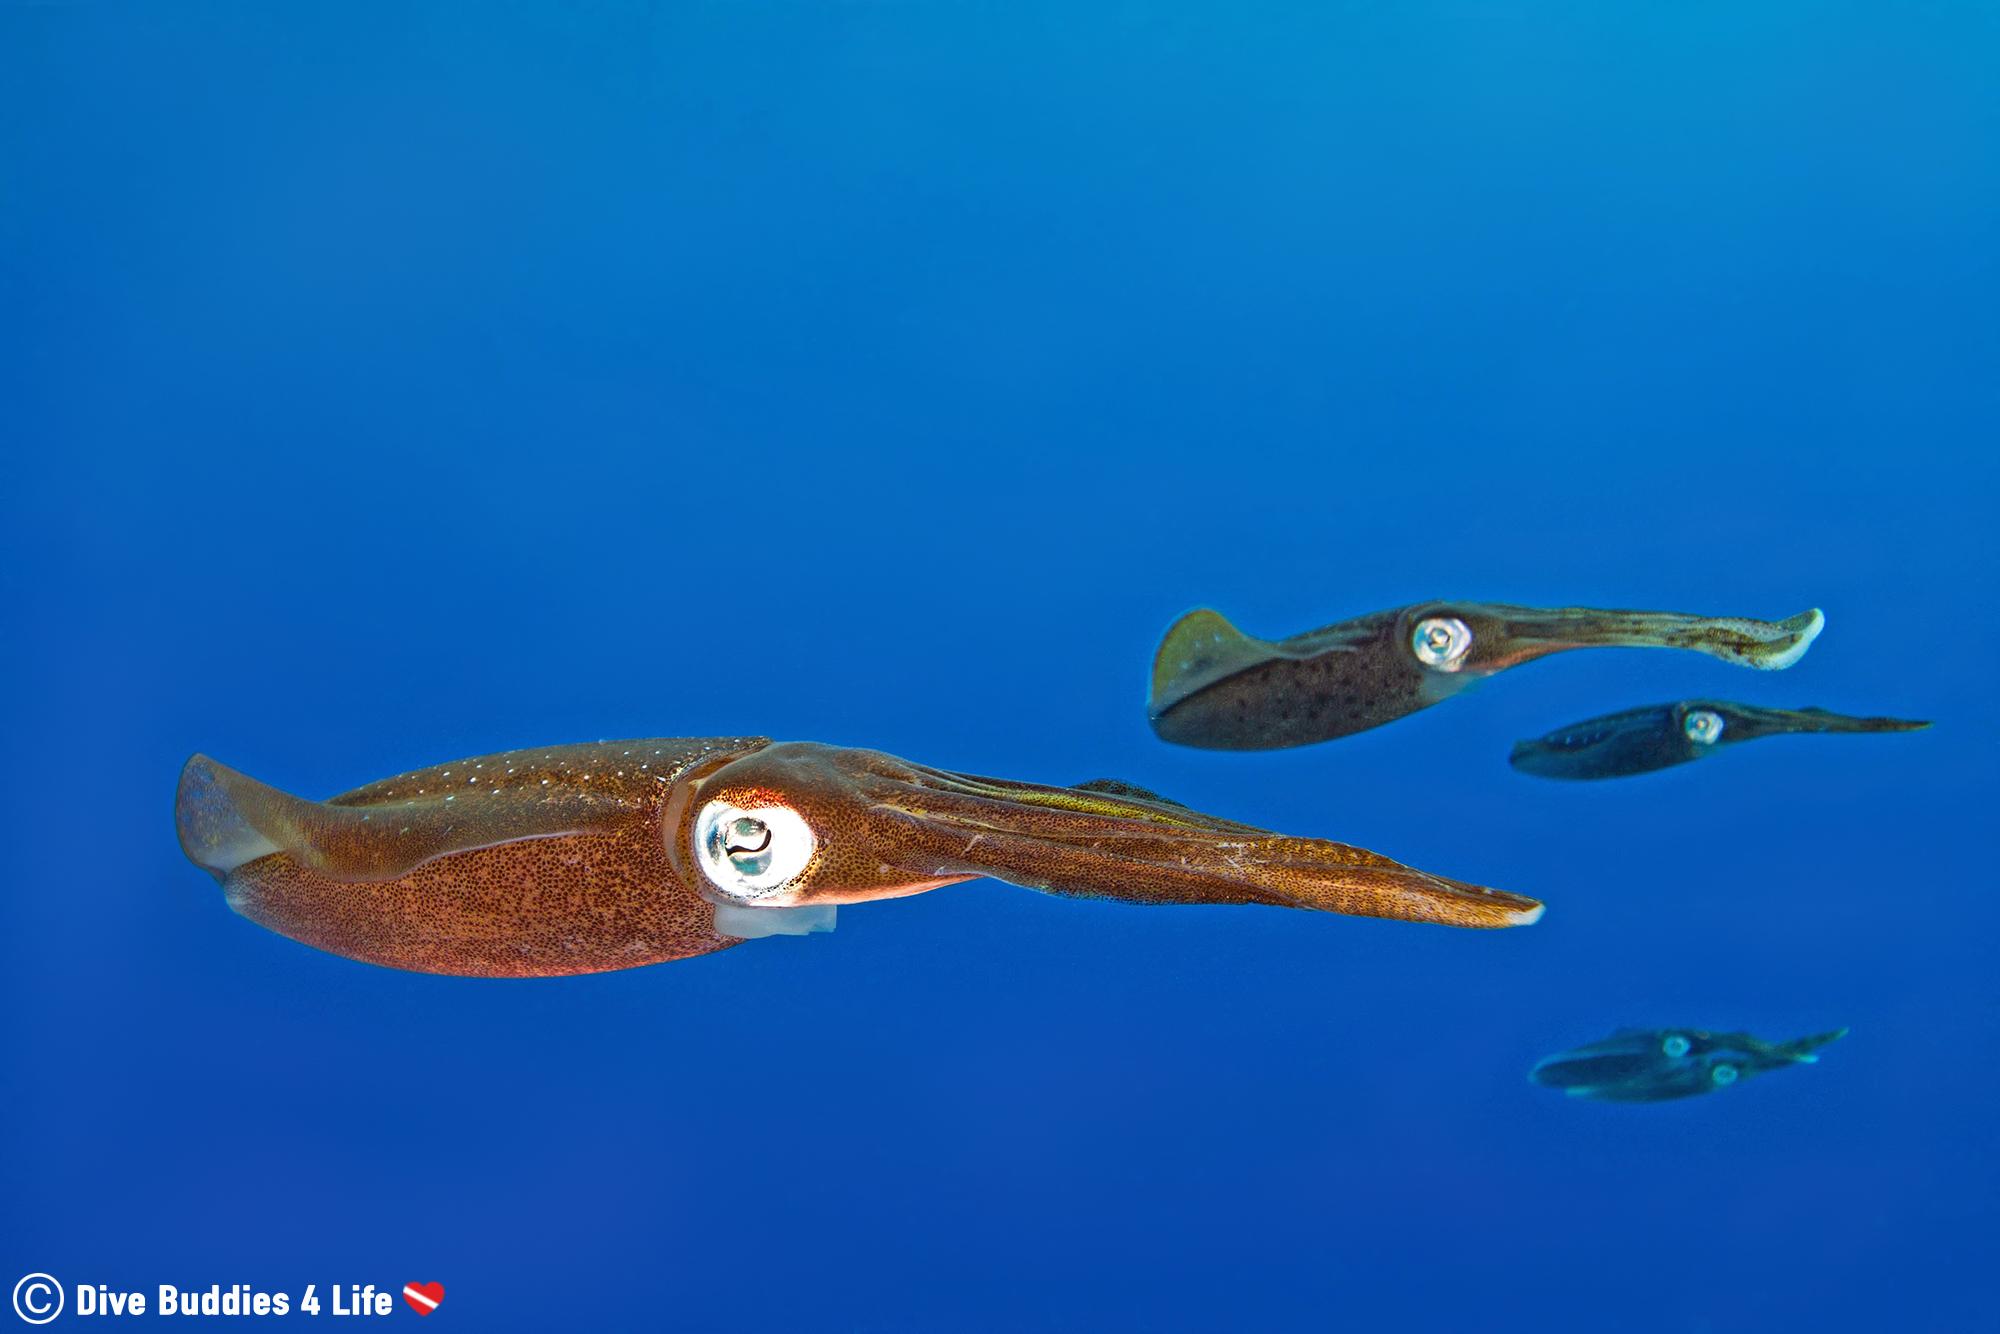 A Group Of Squid In The Blue Caribbean Water Of Bonaire, Salt Pier Dive Site, Scuba Diving The Dutch Caribbean